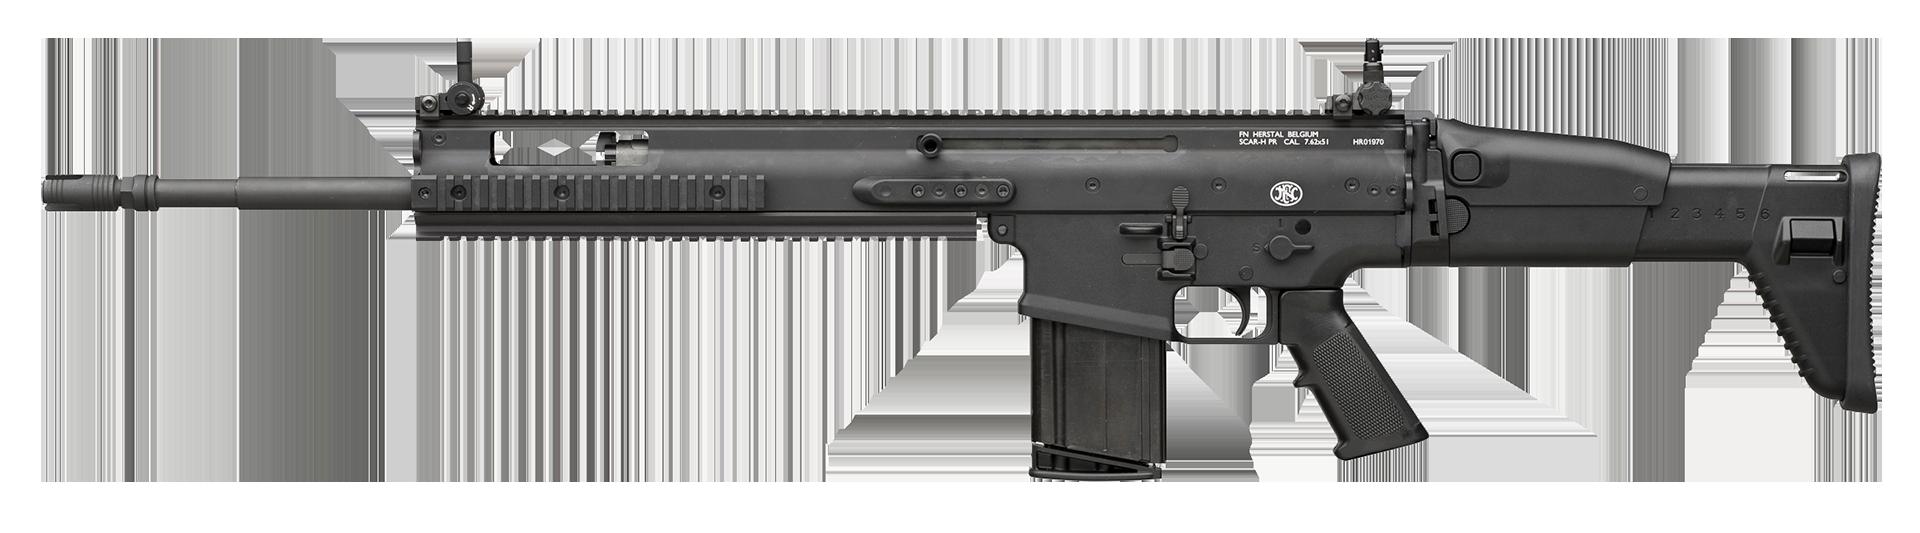 FN SCAR®-H PR